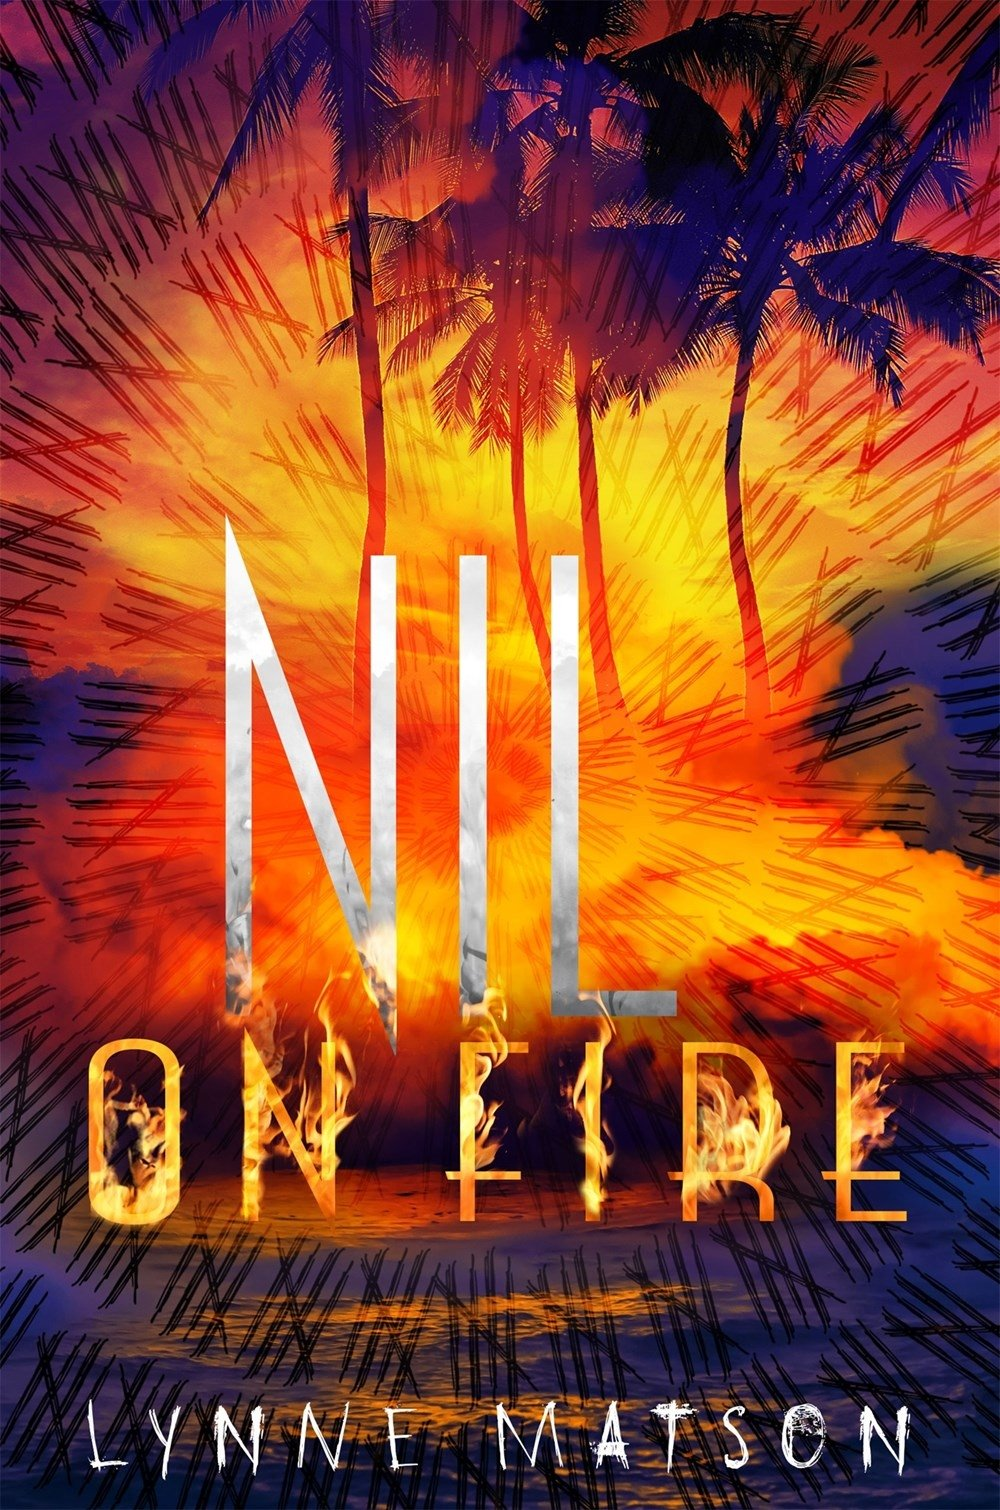 Nil on Fire (Anglais) Relié – 31 mai 2016 Lynne Matson Metropolitan Books 1627792953 Kinder- und Jugendbücher